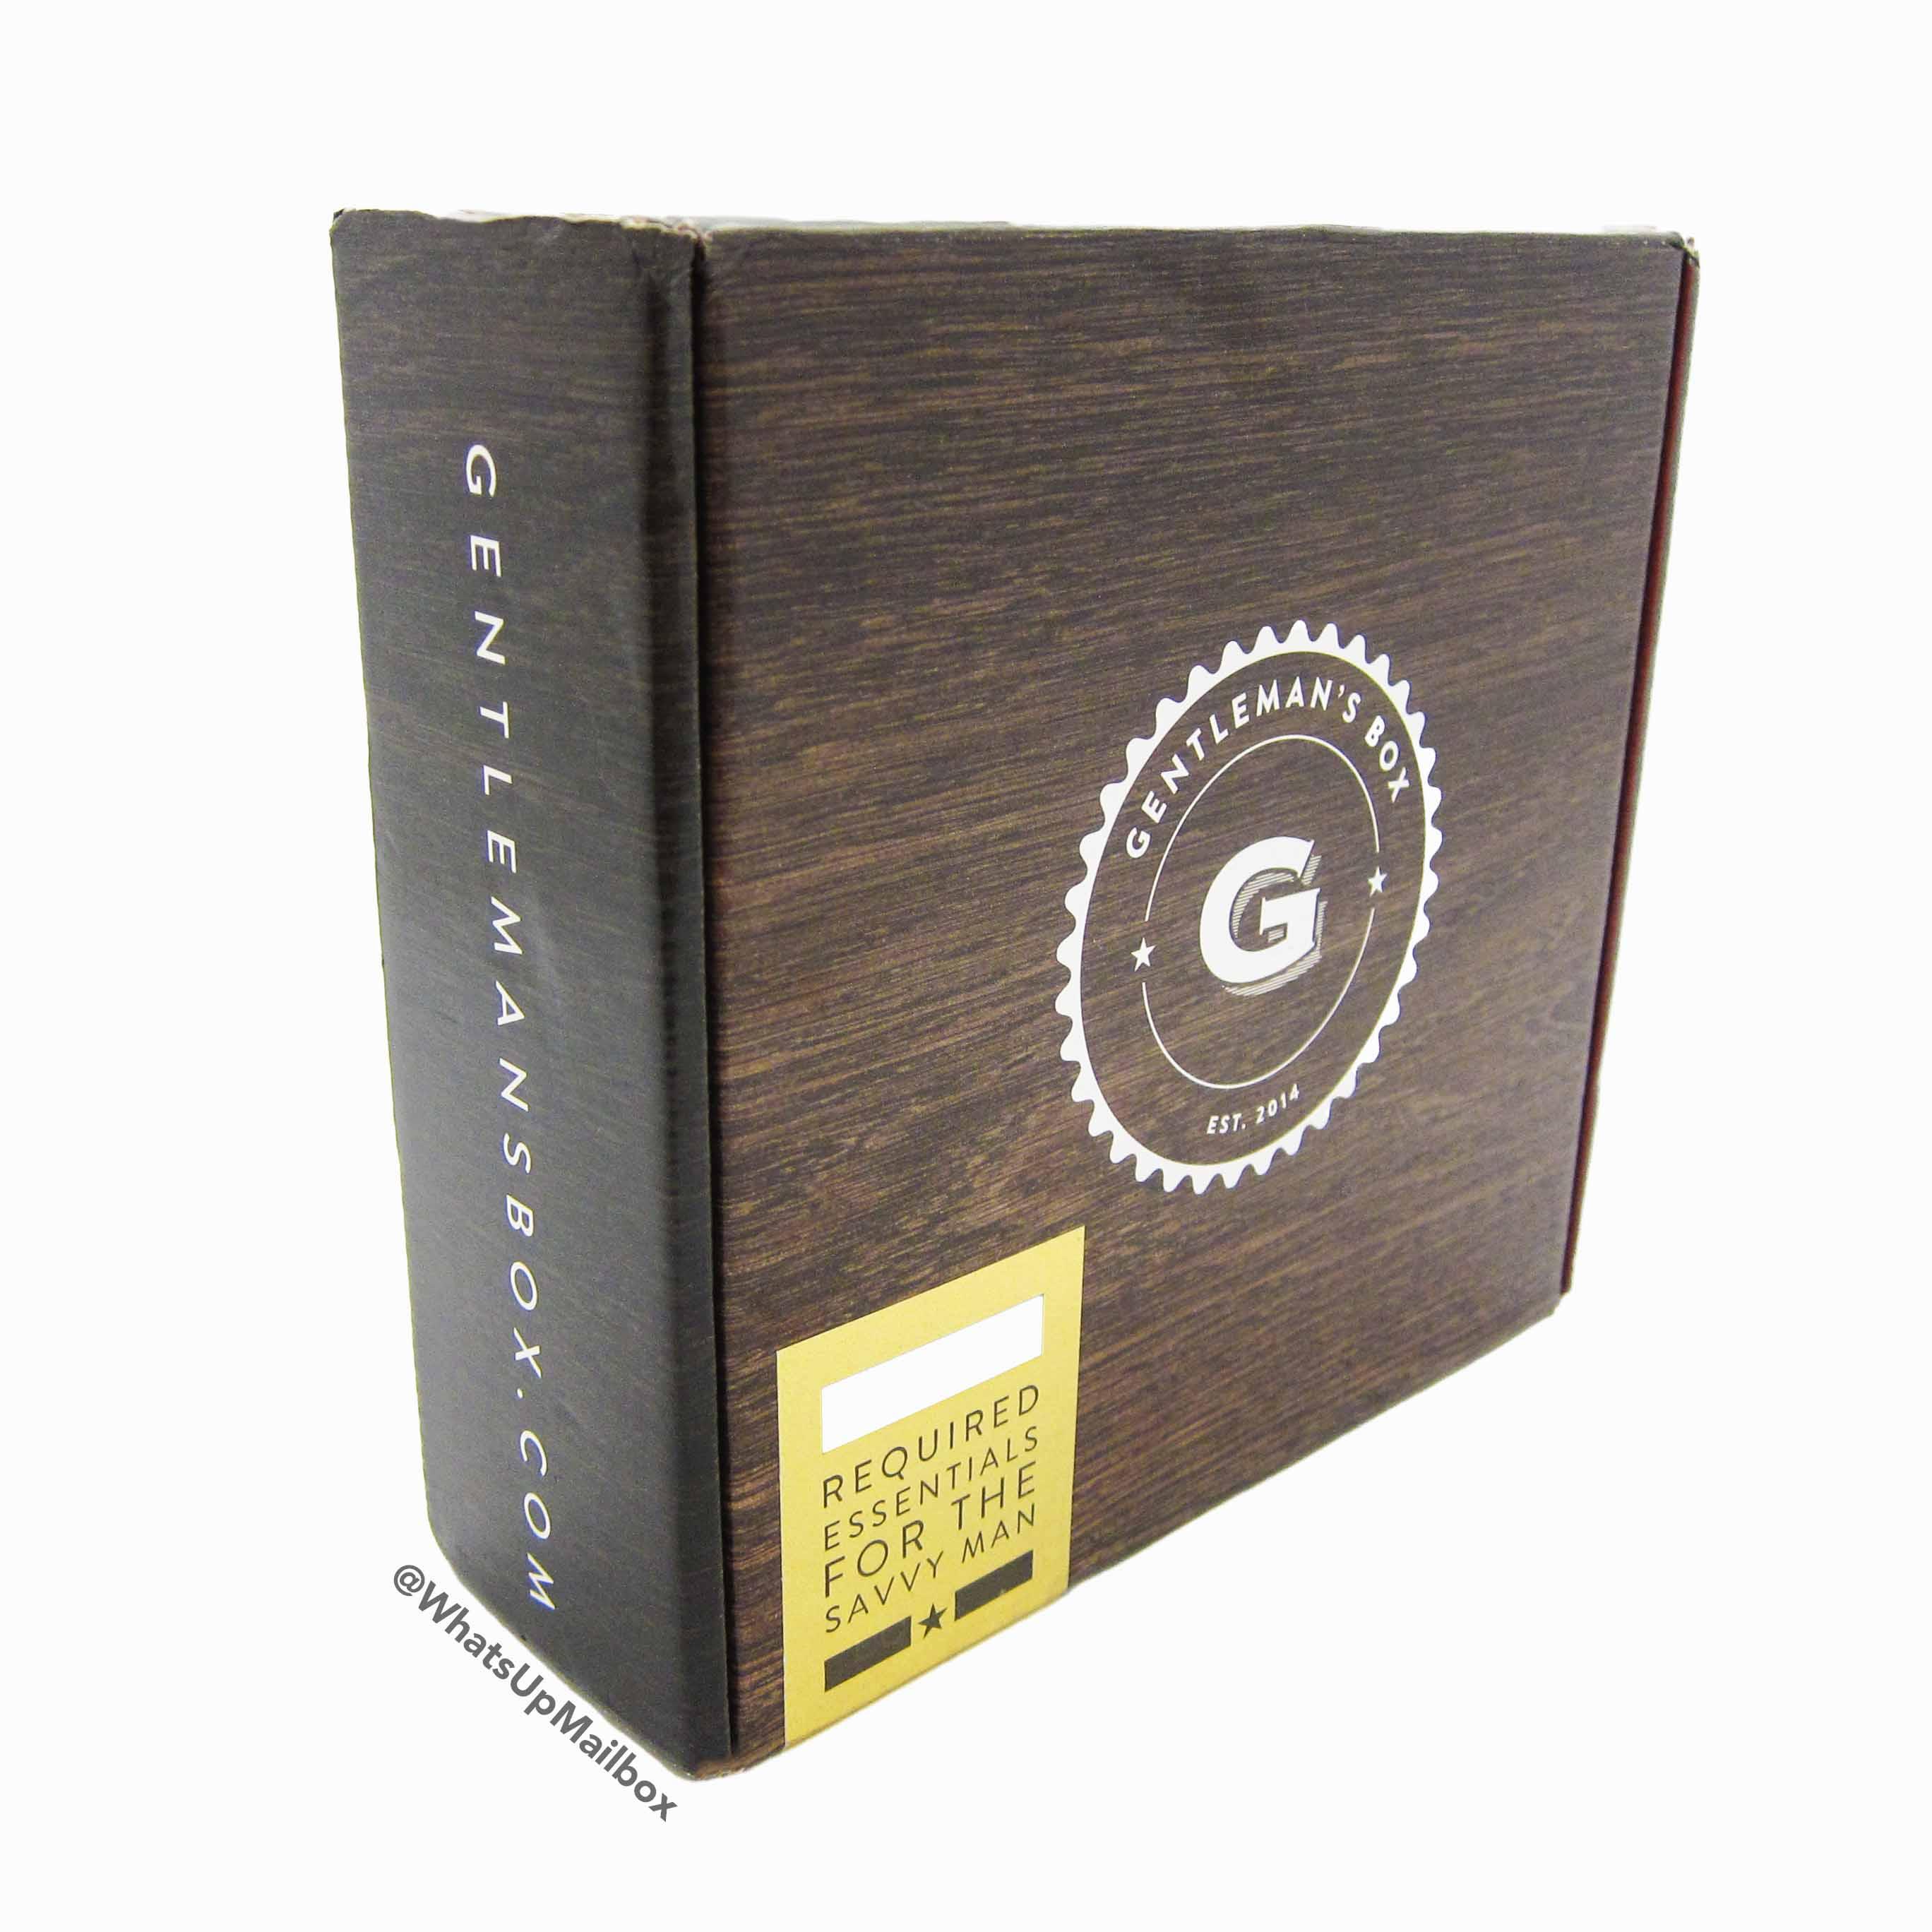 Gentleman's Box September 2016 Box